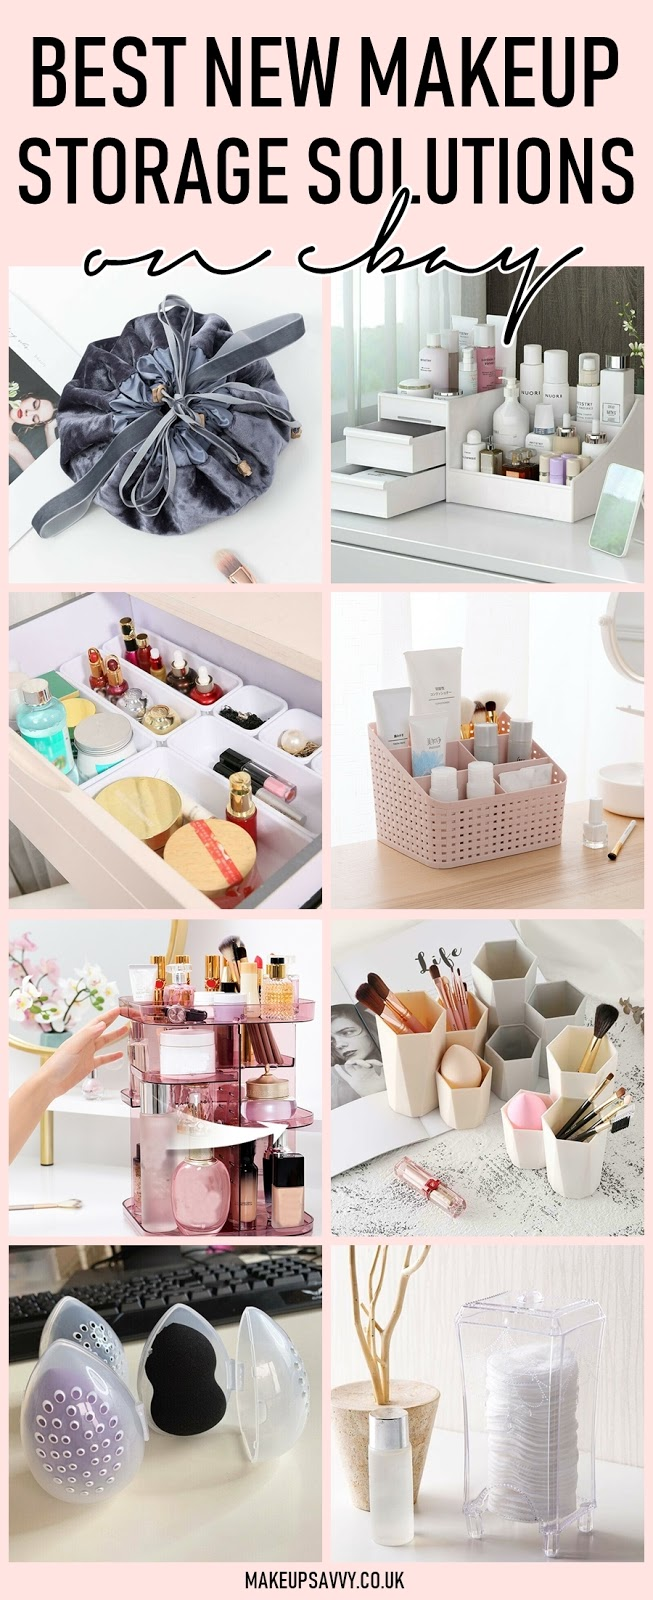 Best New eBay Makeup Storage Solutions 2020